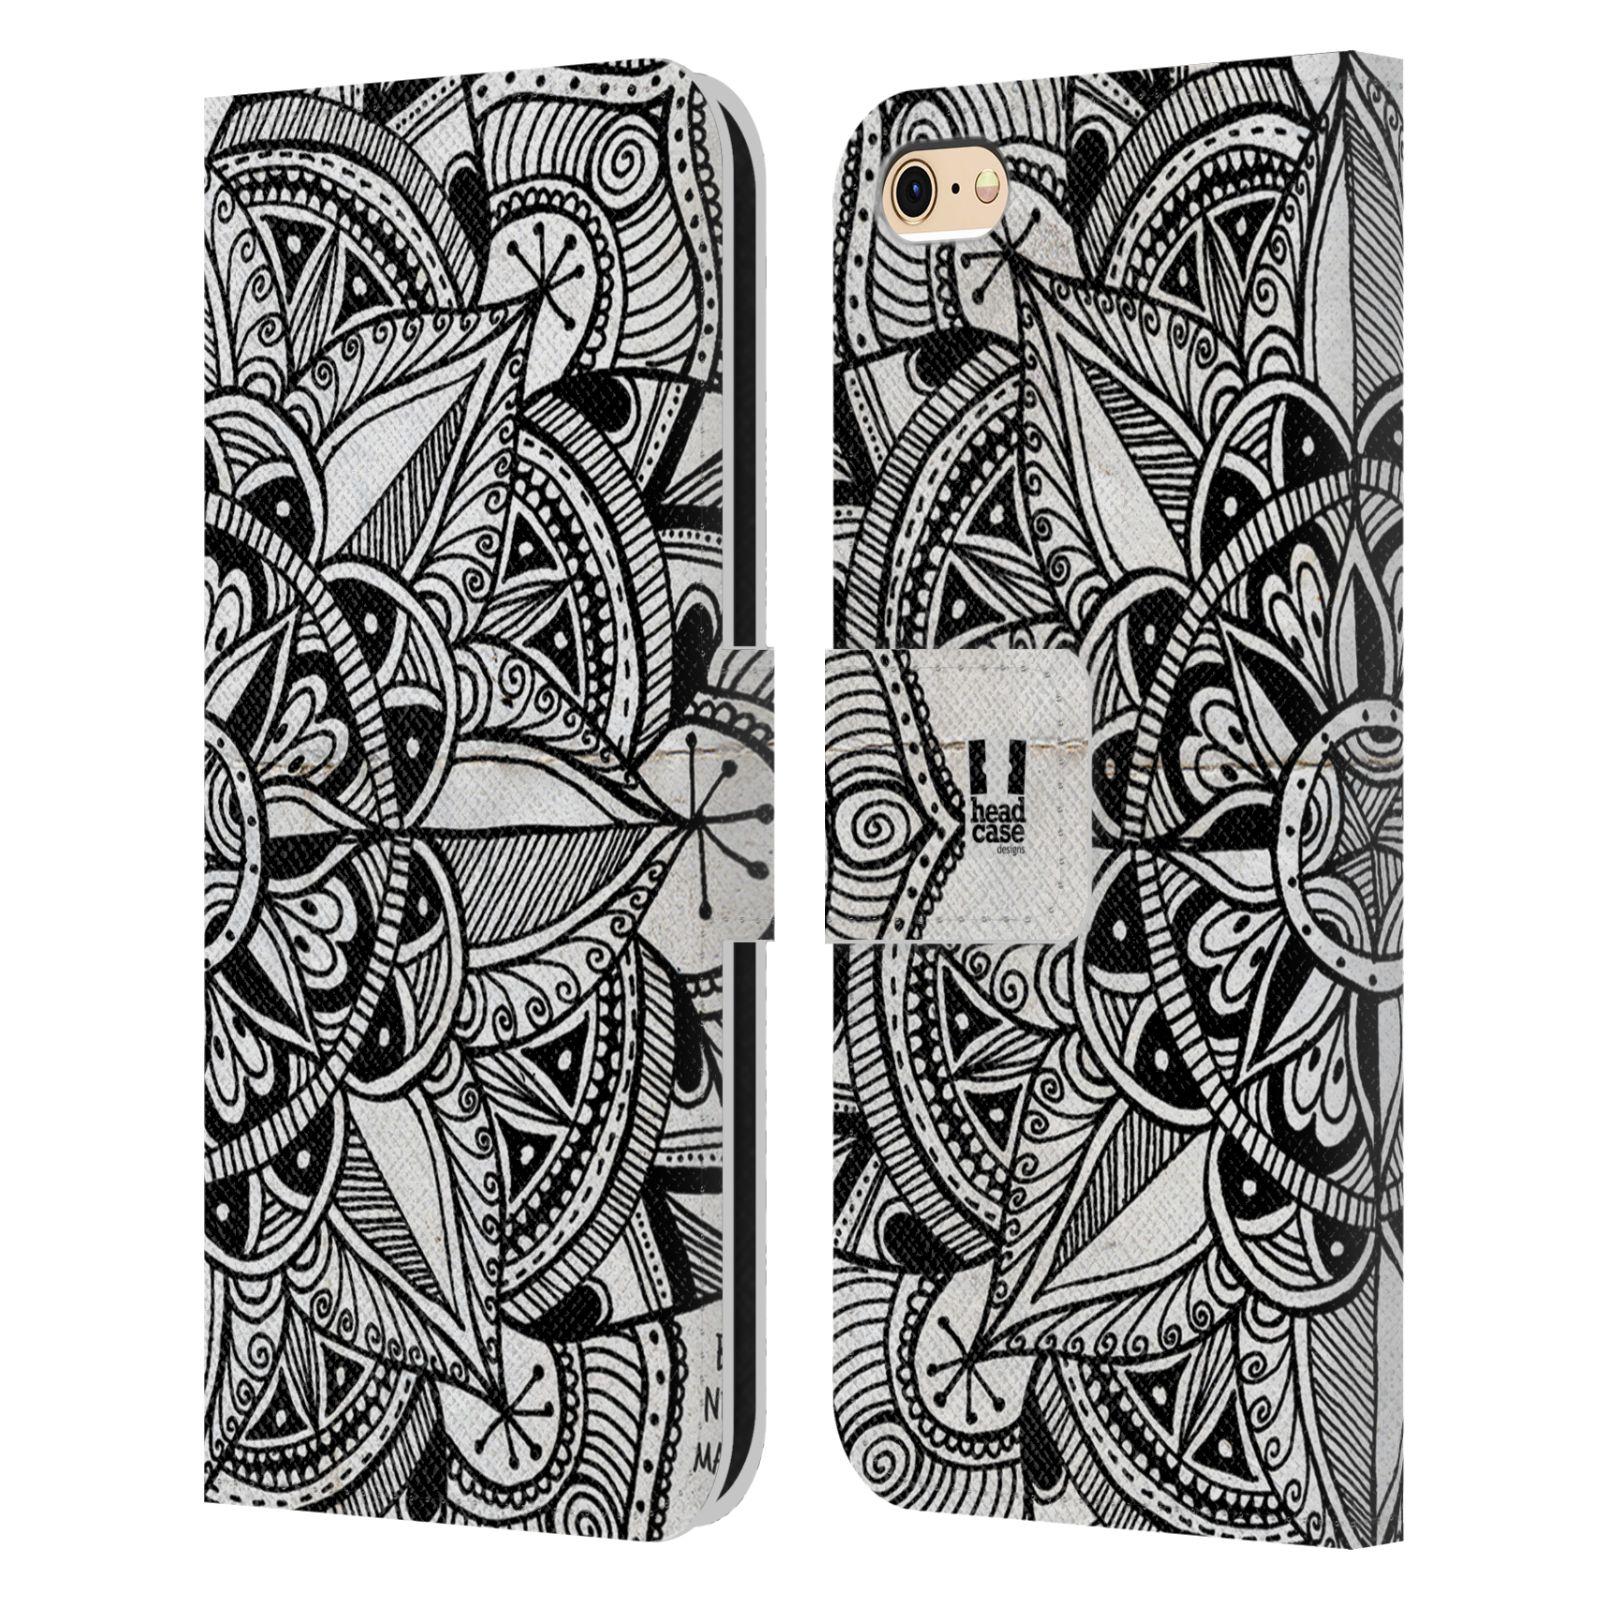 HEAD CASE Flipové pouzdro pro mobil Apple Iphone 6/6s mandala kreslená papír a kompas černobílá